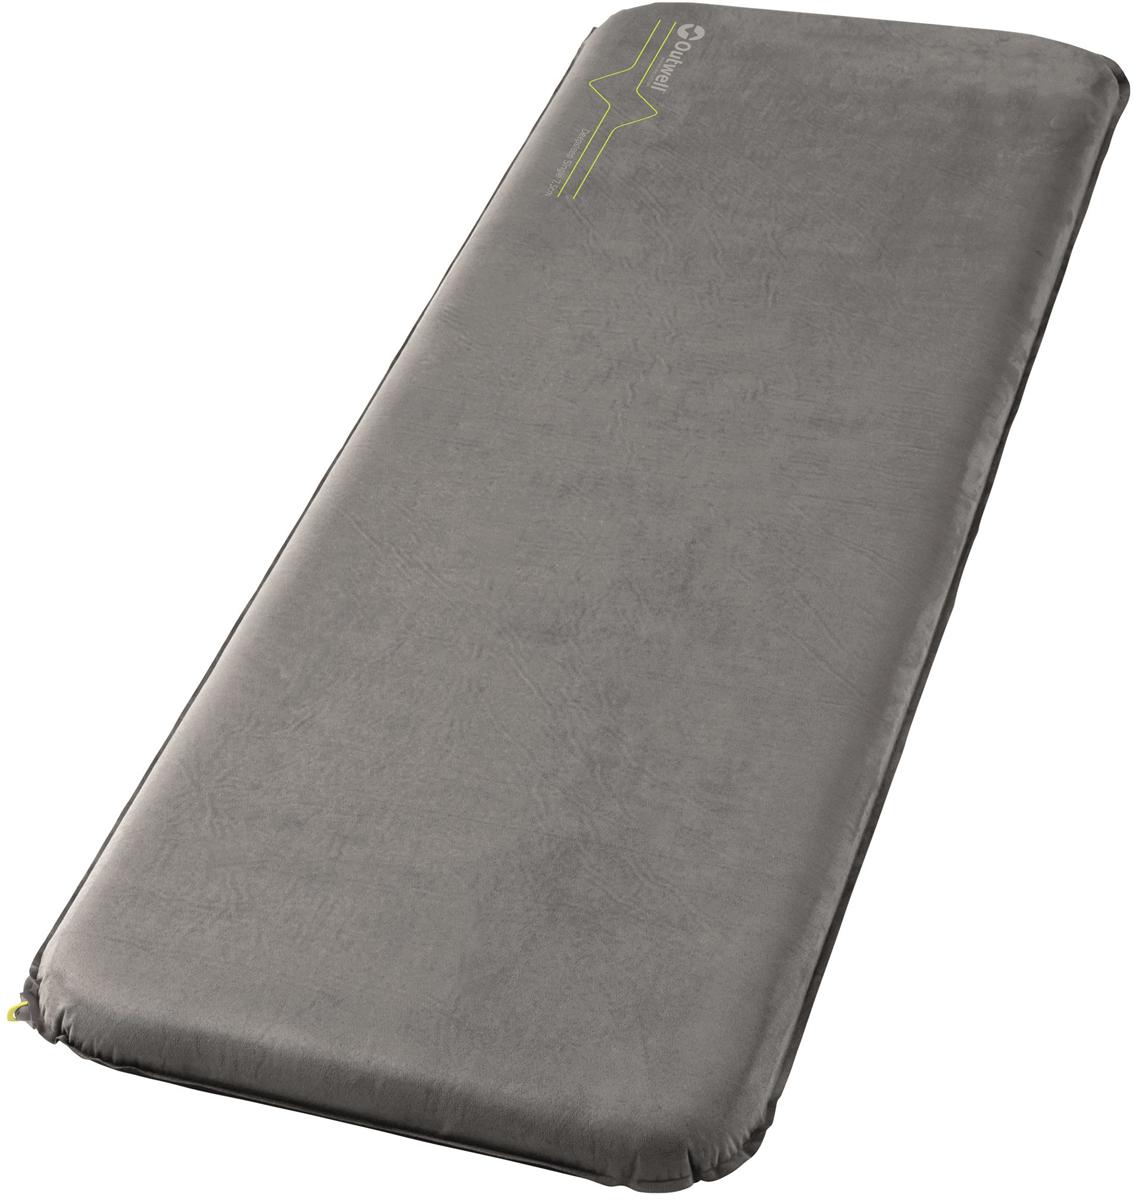 Коврик самонадувающийся Outwell Deepsleep Single, 195 х 63 х 7,5 см настил outwell footprint billings 4